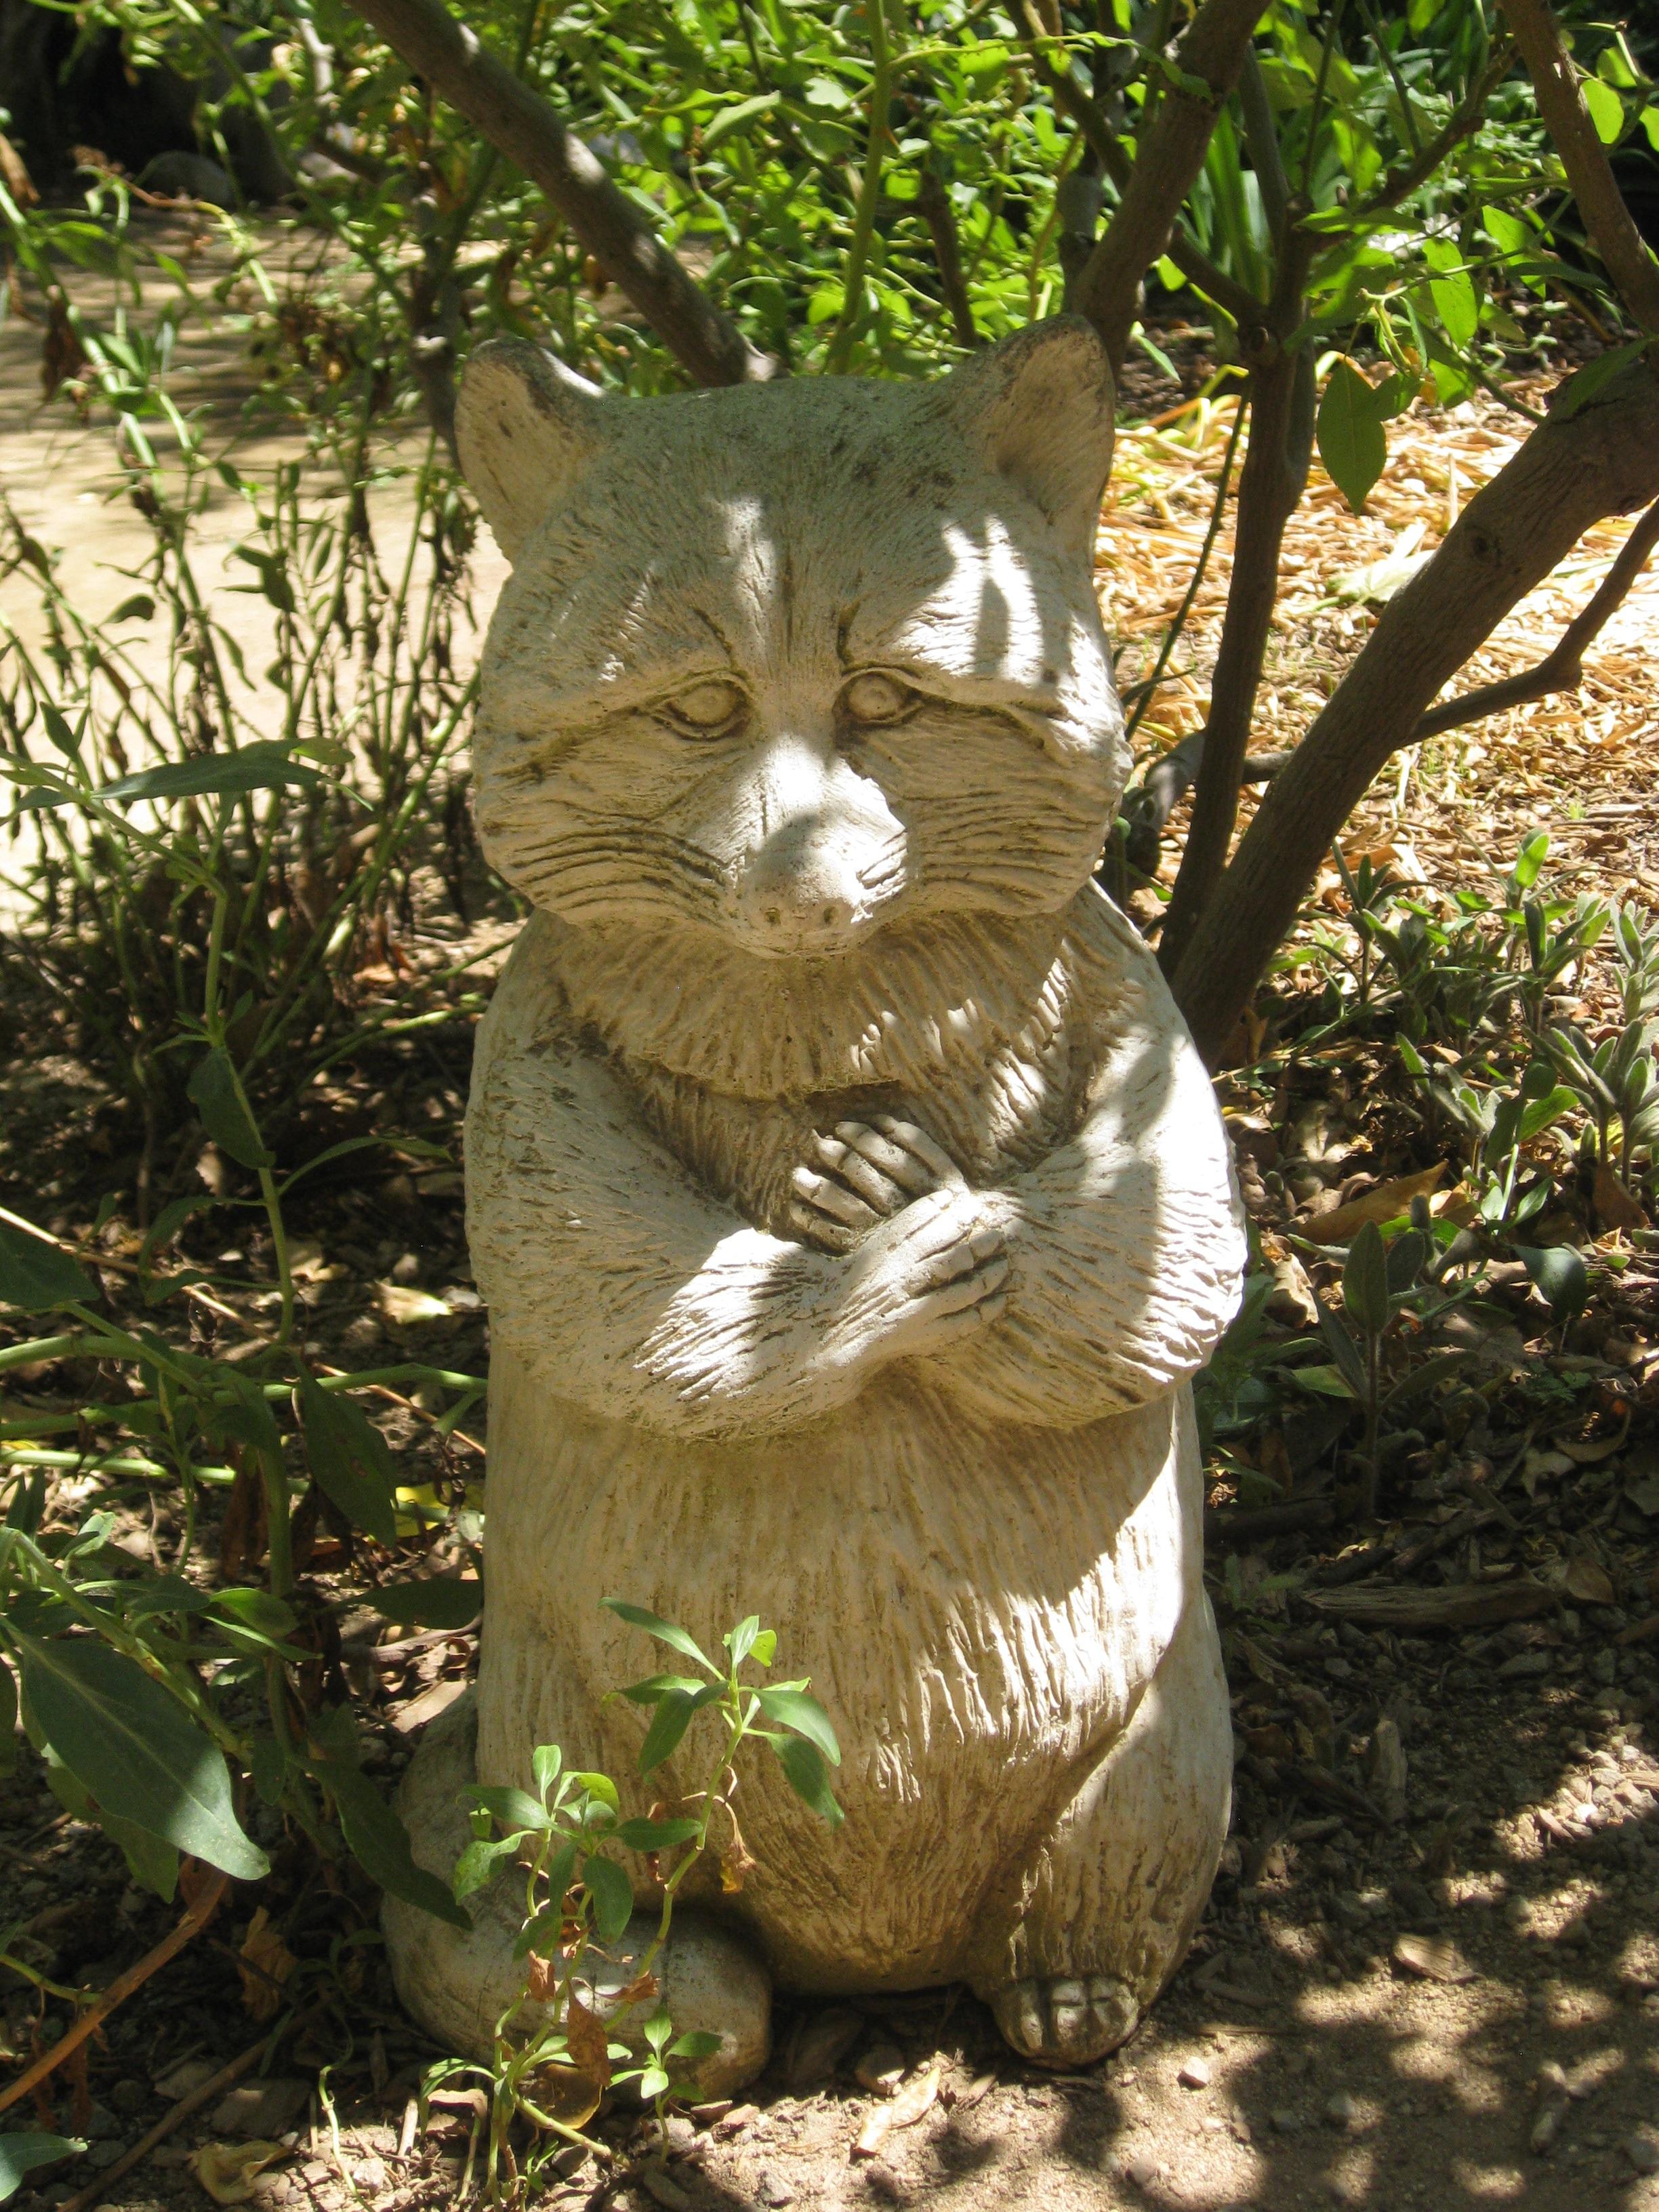 garden in malbin file commons wiki haifa statue wikimedia cat ursula sculpture